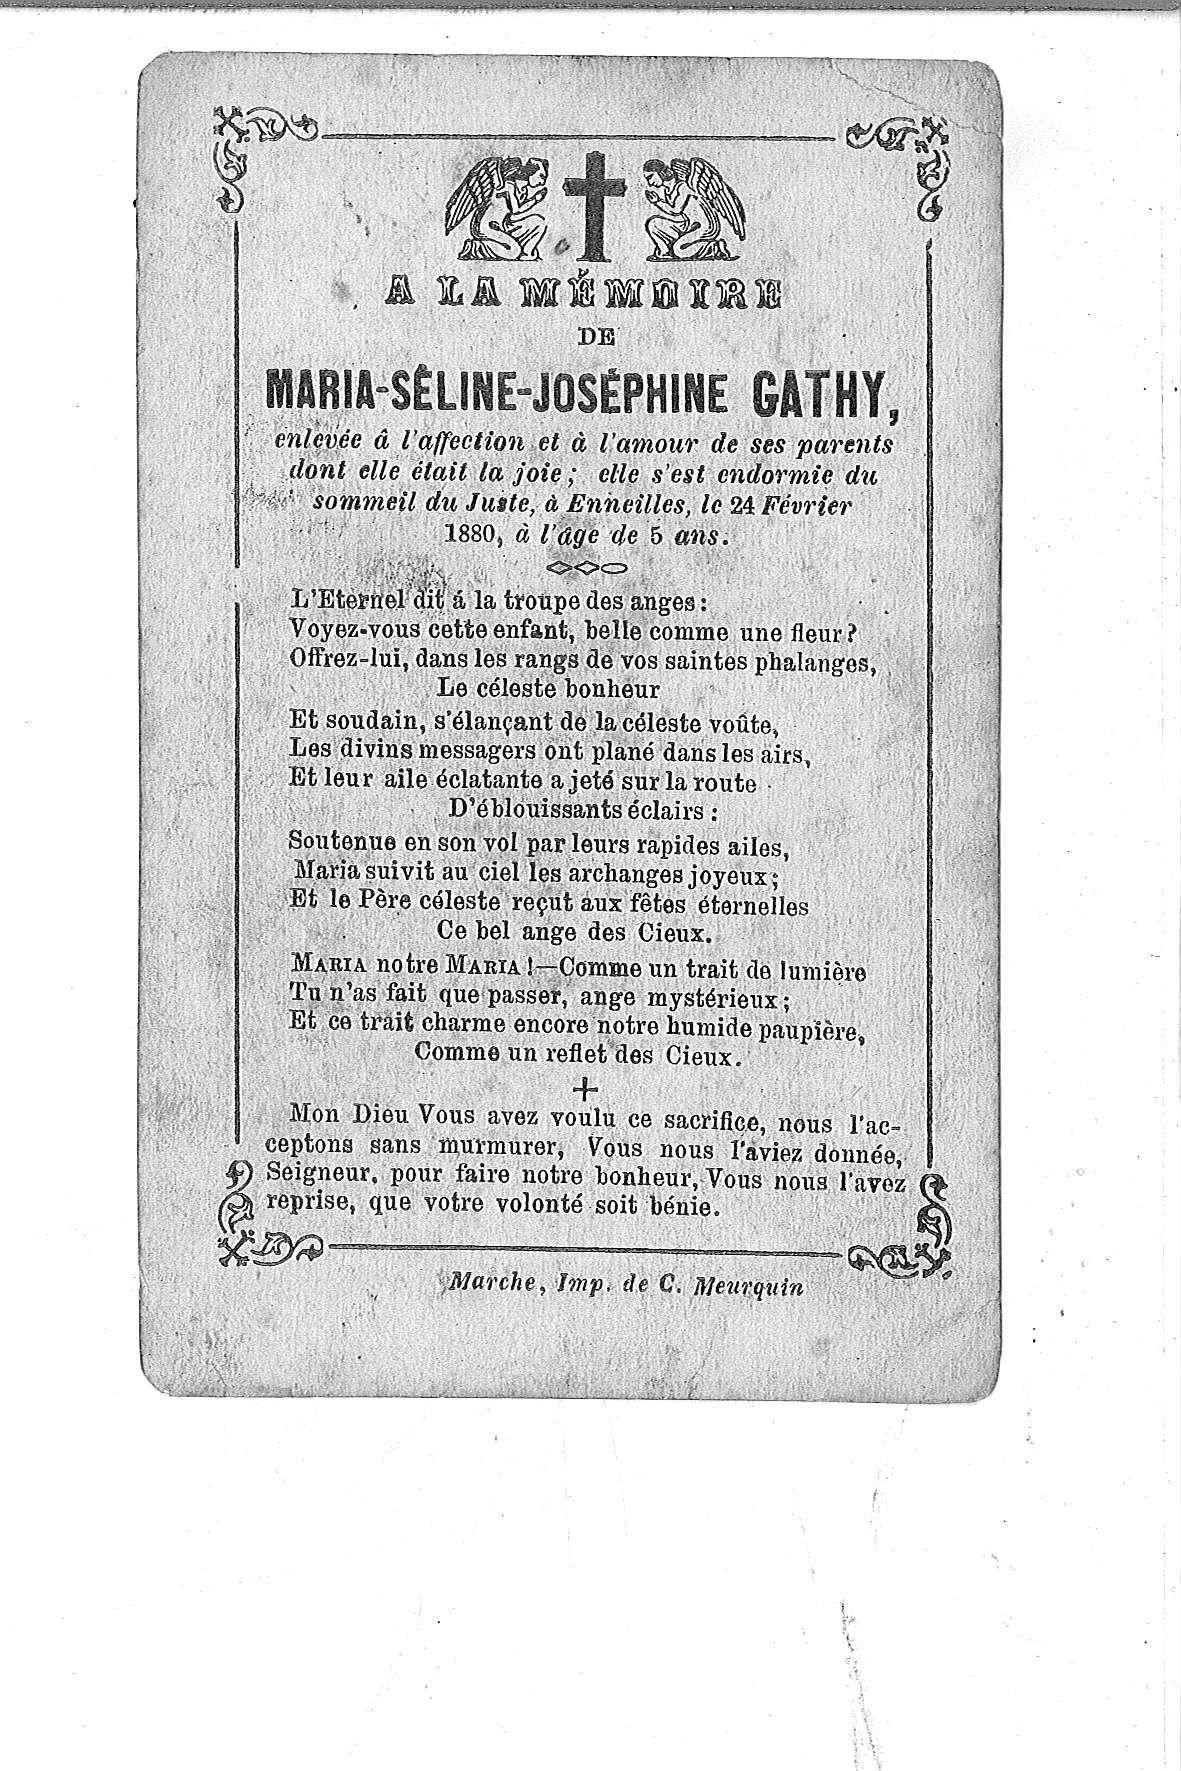 Maria-Séline-Josephine(1880)20130507145631_00019.jpg